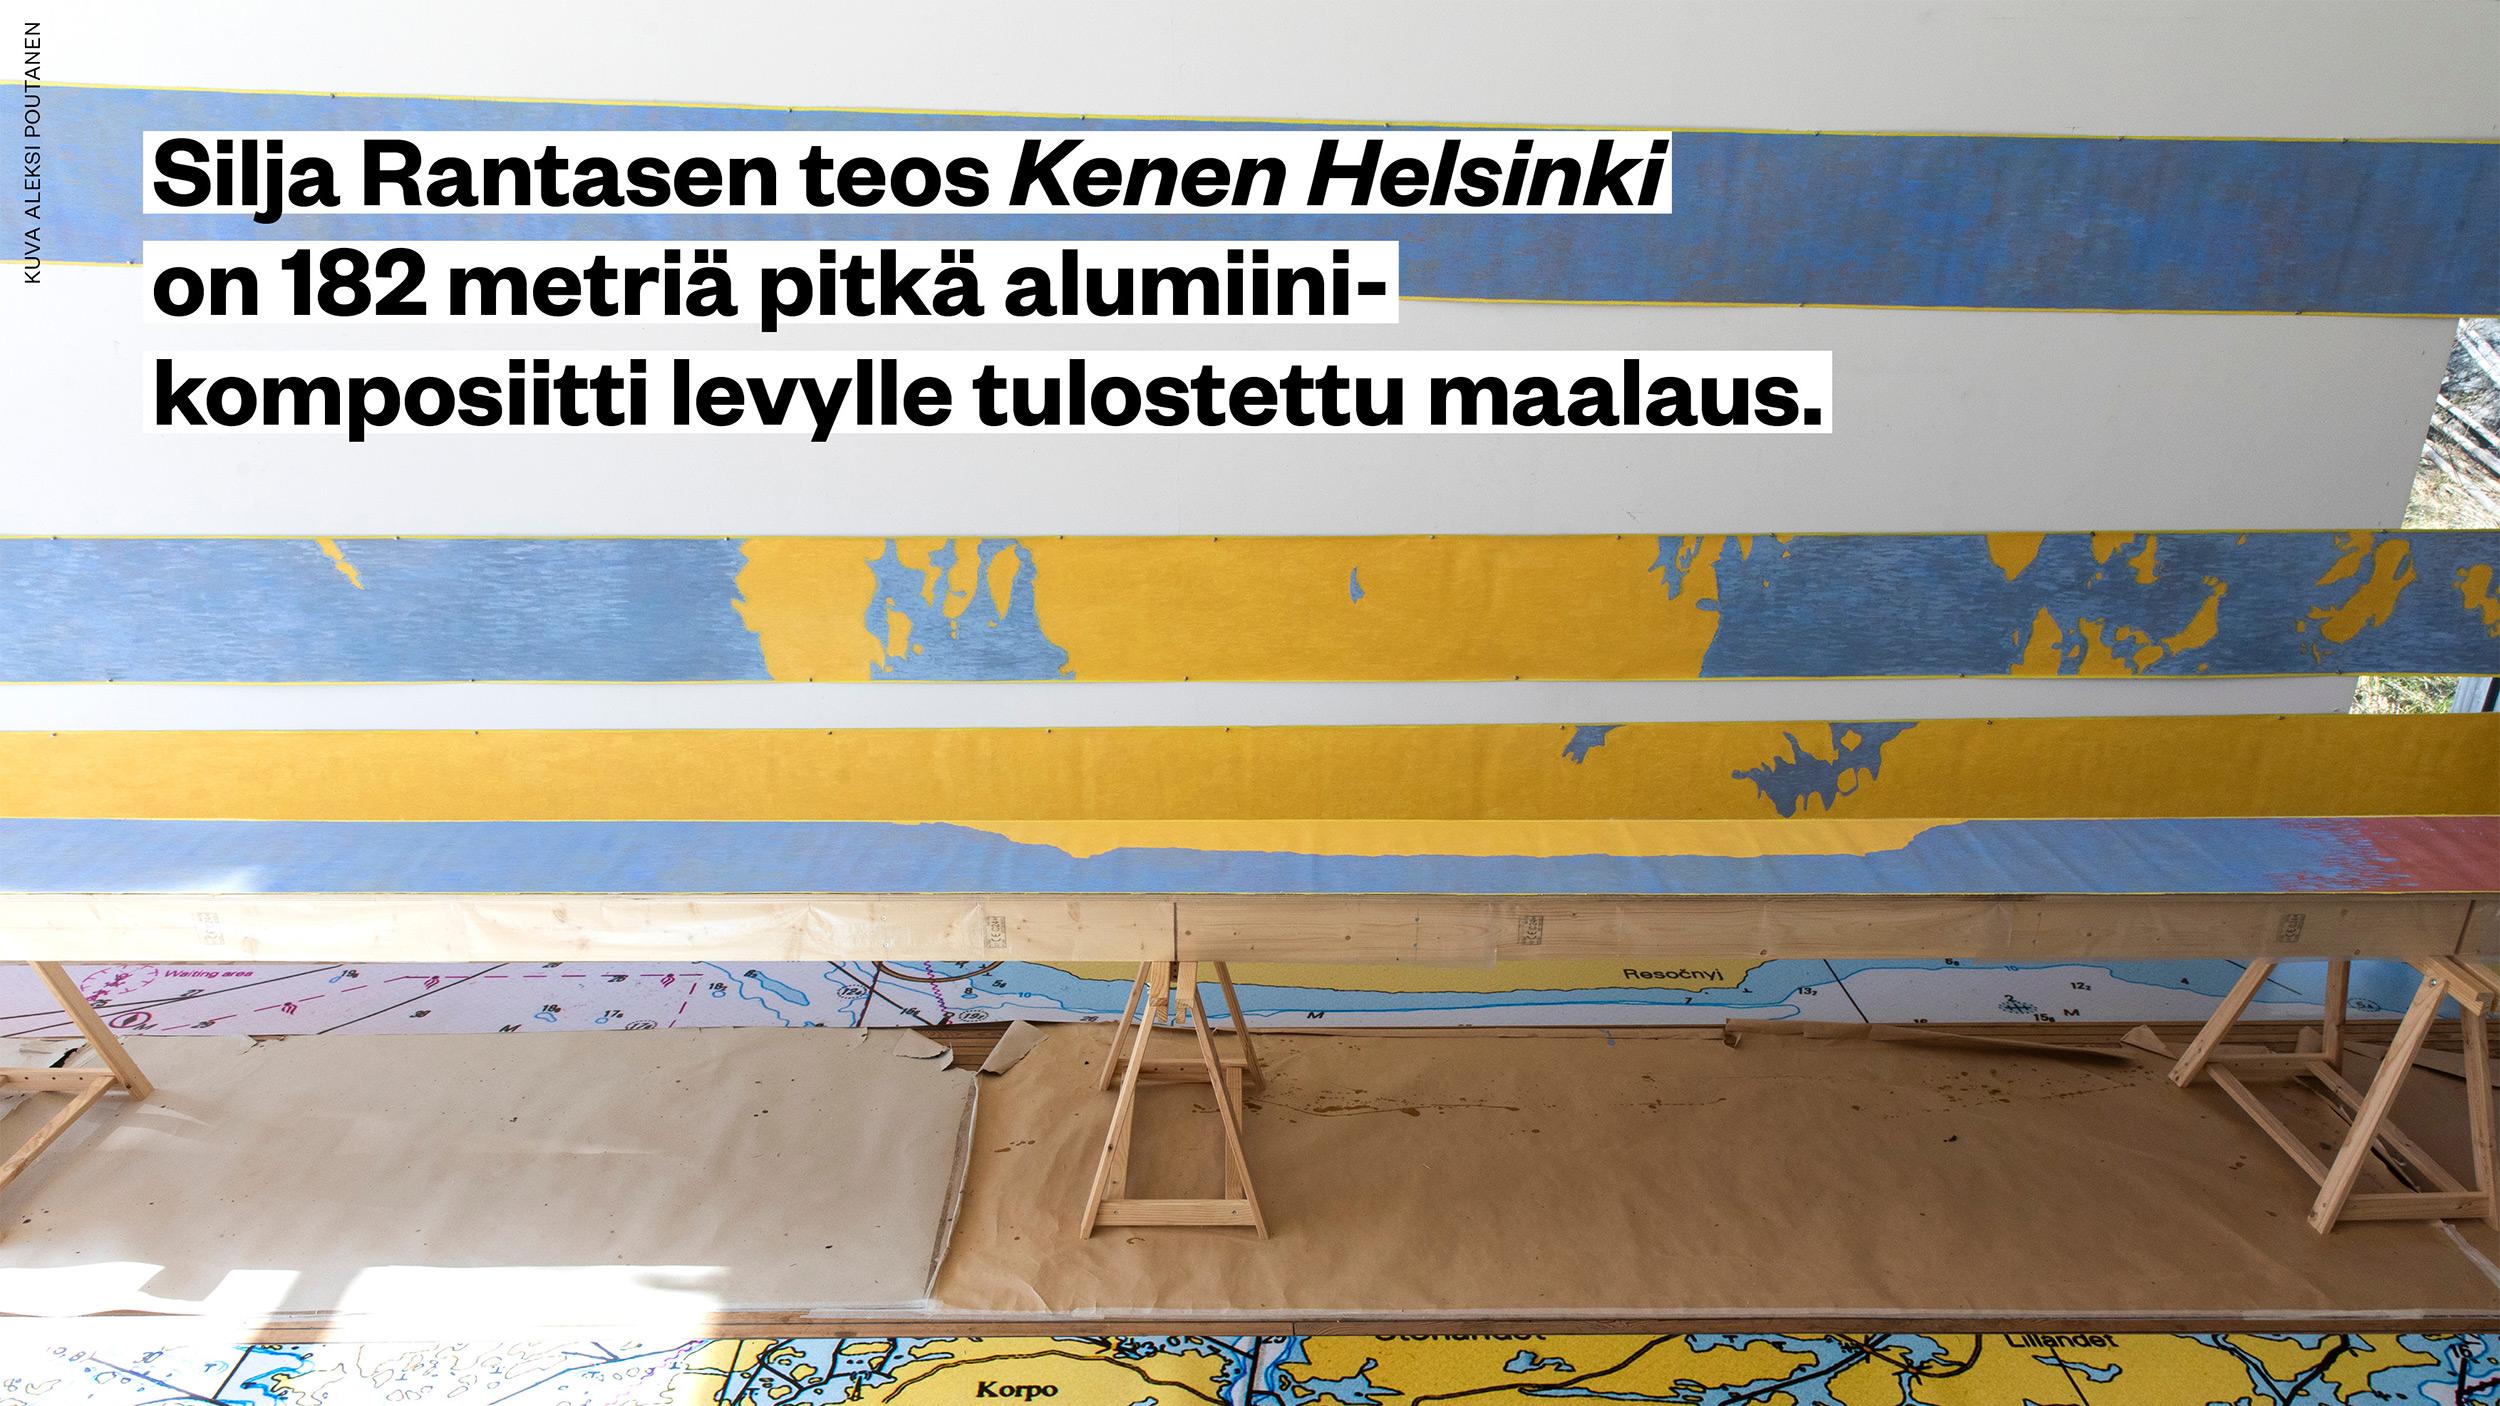 Kenen Helsinki -taideteos